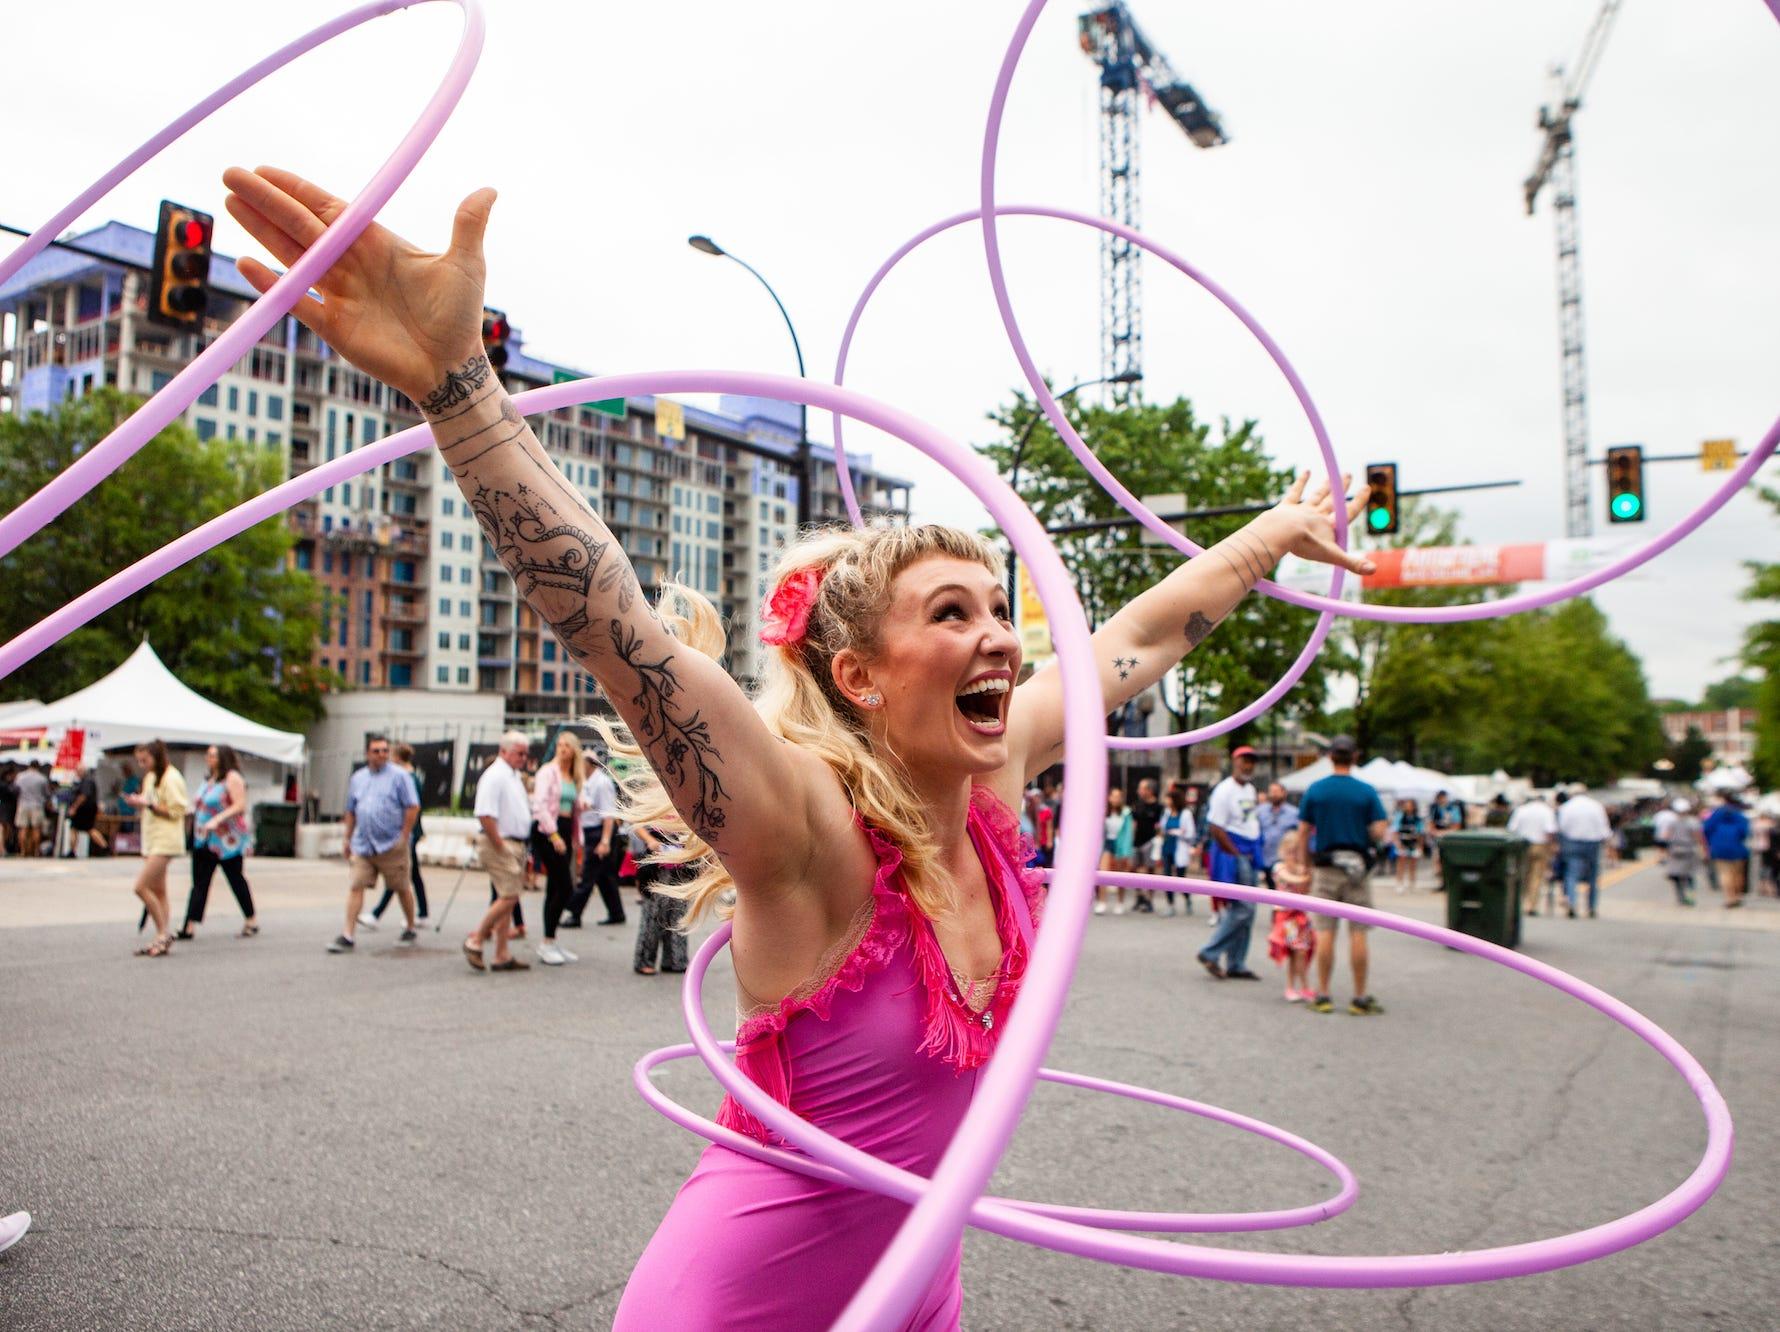 Chloe Wall preforms one of her hula hoop routines during Artisphere on Saturday, May 11, 2019.